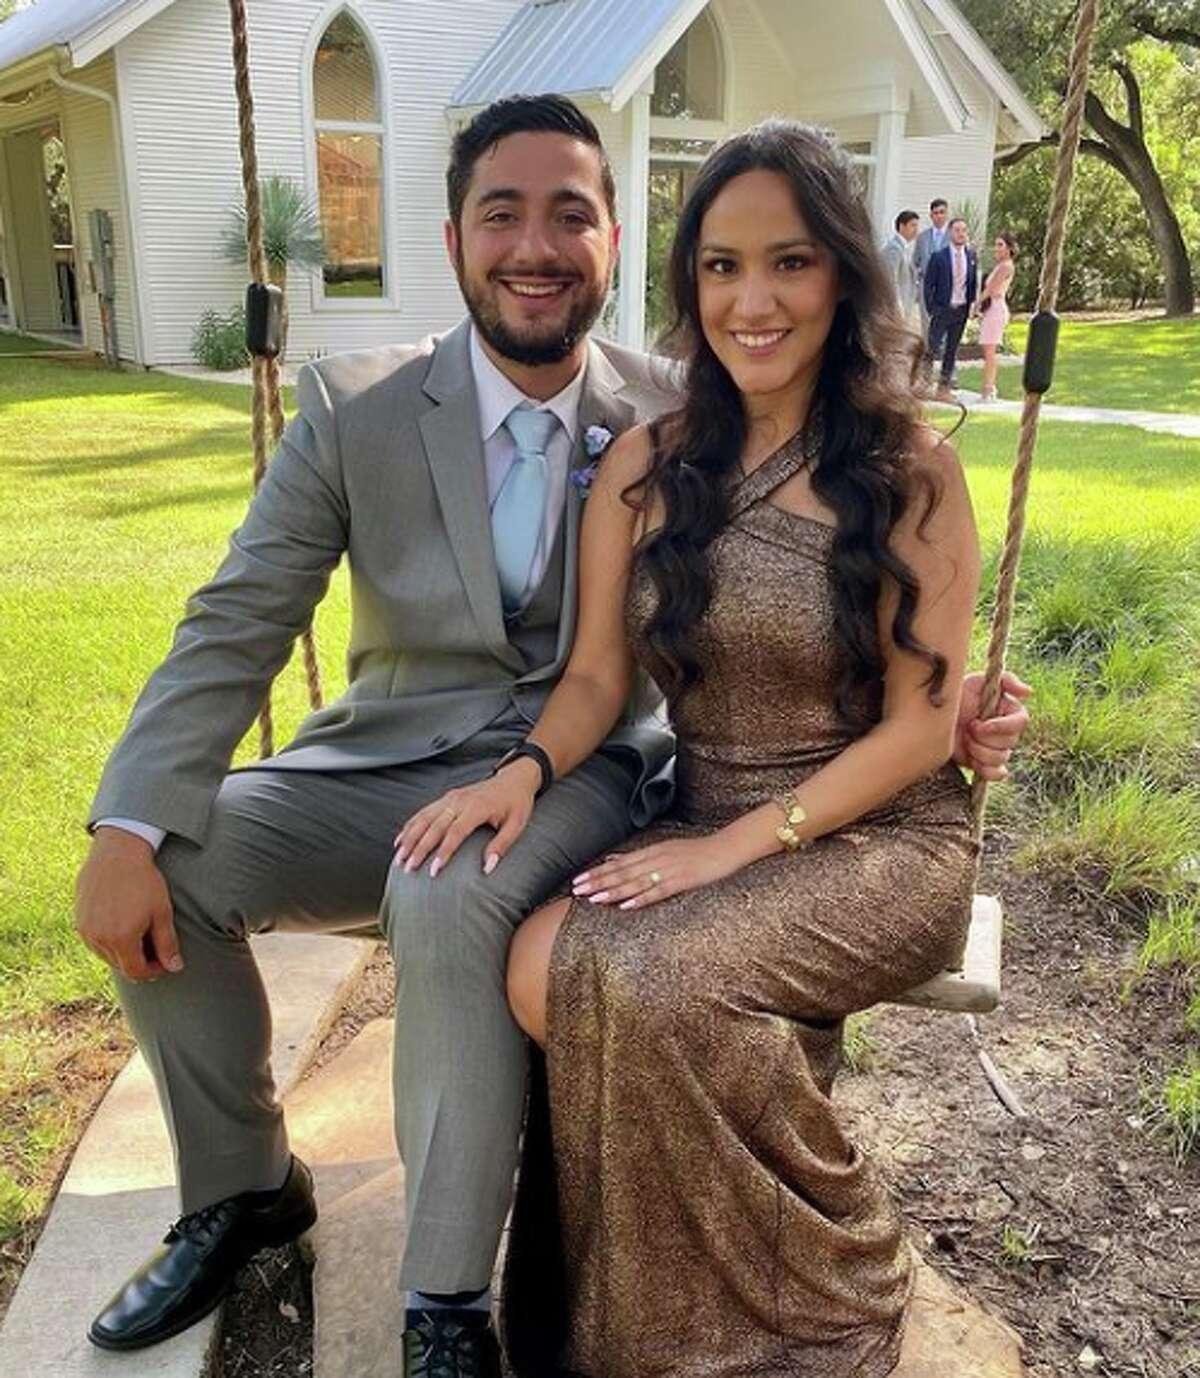 Lisa Torres and her fiancé Alex Cortes